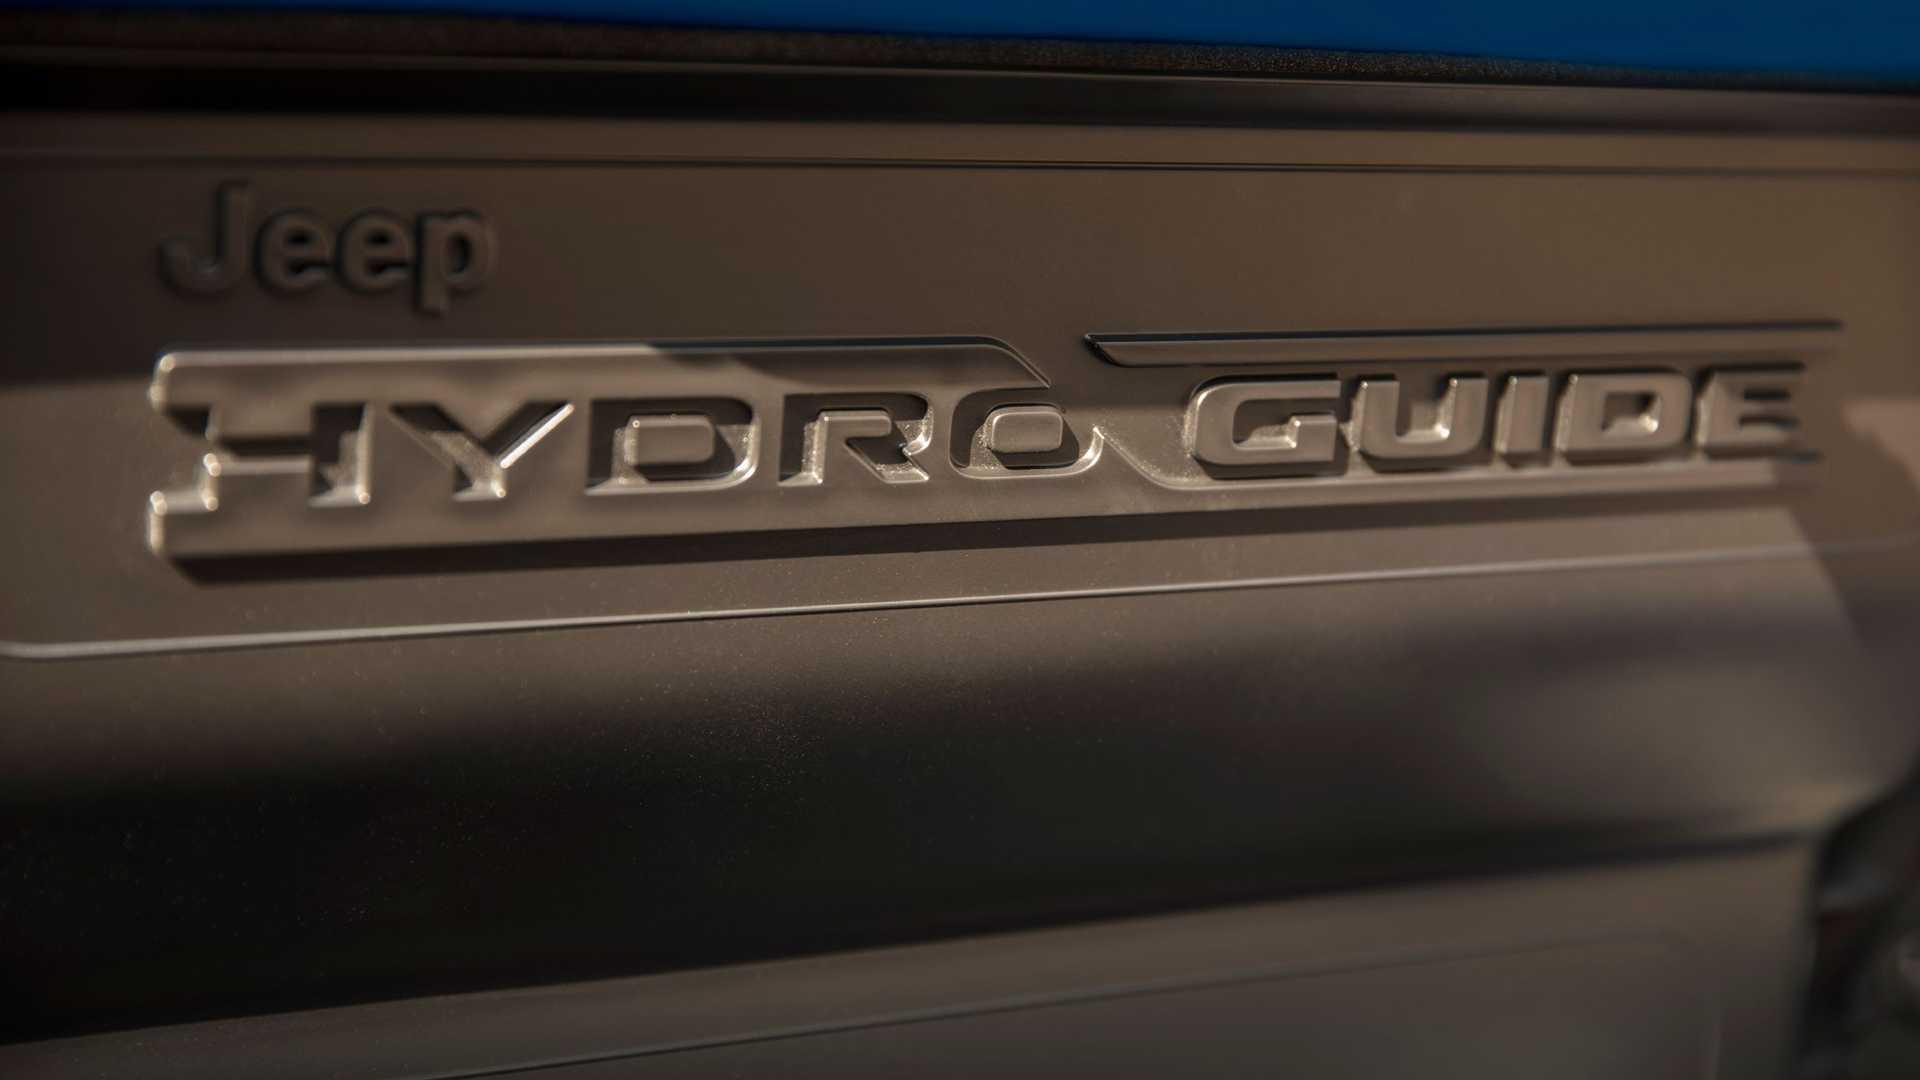 2021-jeep-wrangler-rubicon-392-hydro-guide-intake